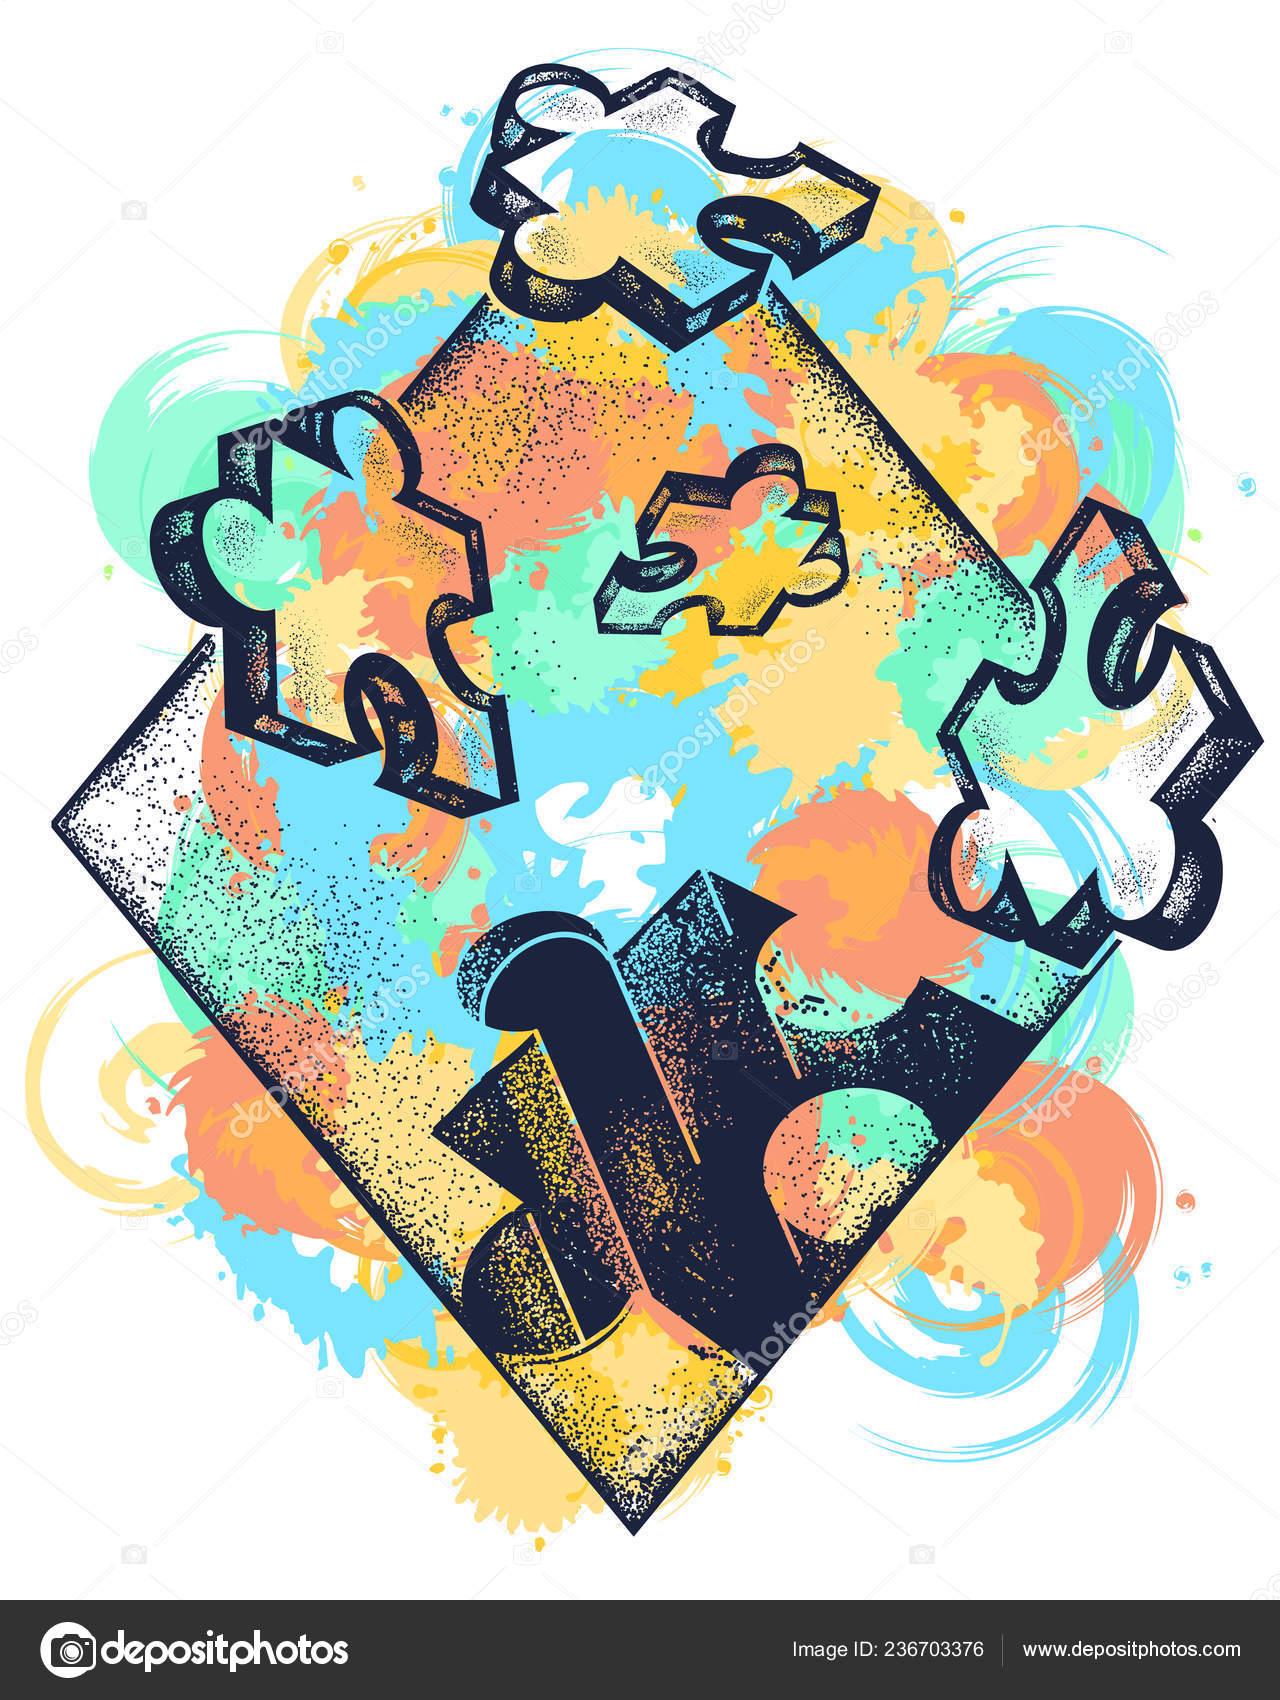 Symbol Education Business Solution Tasks Communications Psychology